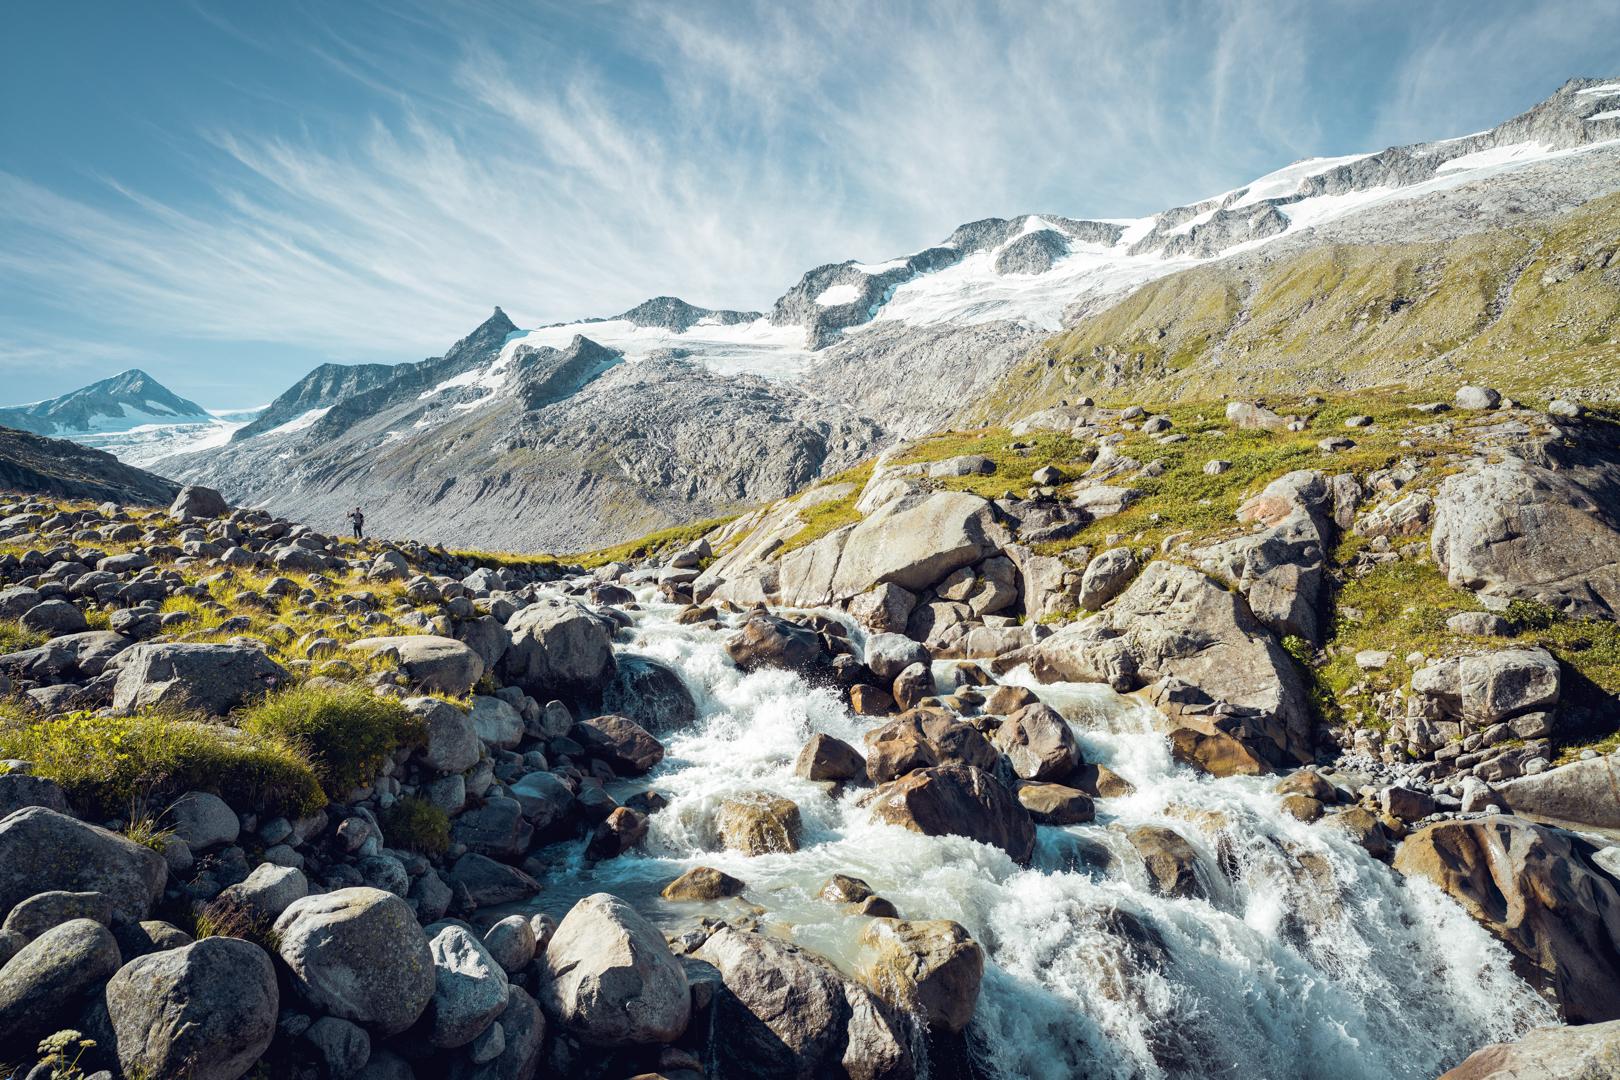 © Stefan Leitner, Nationalparks Austria Hohe Tauern